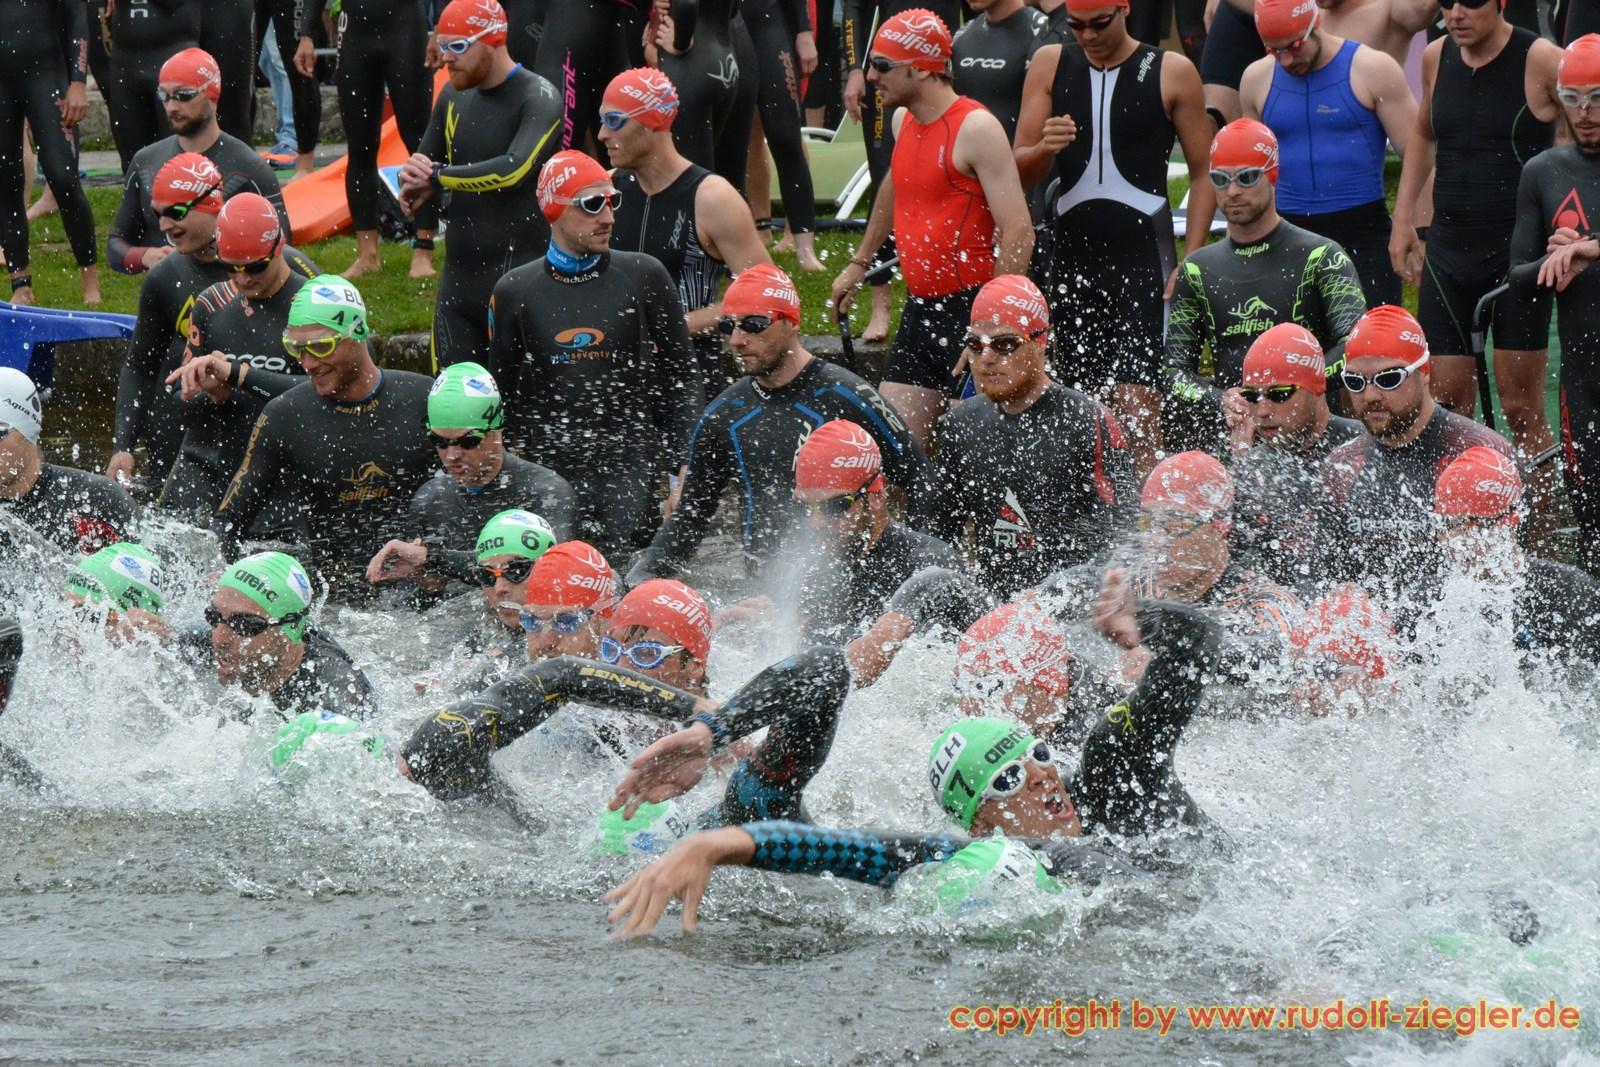 Kapuziner Alkoholfrei Triathlon 2016 103-A (1600x1200)